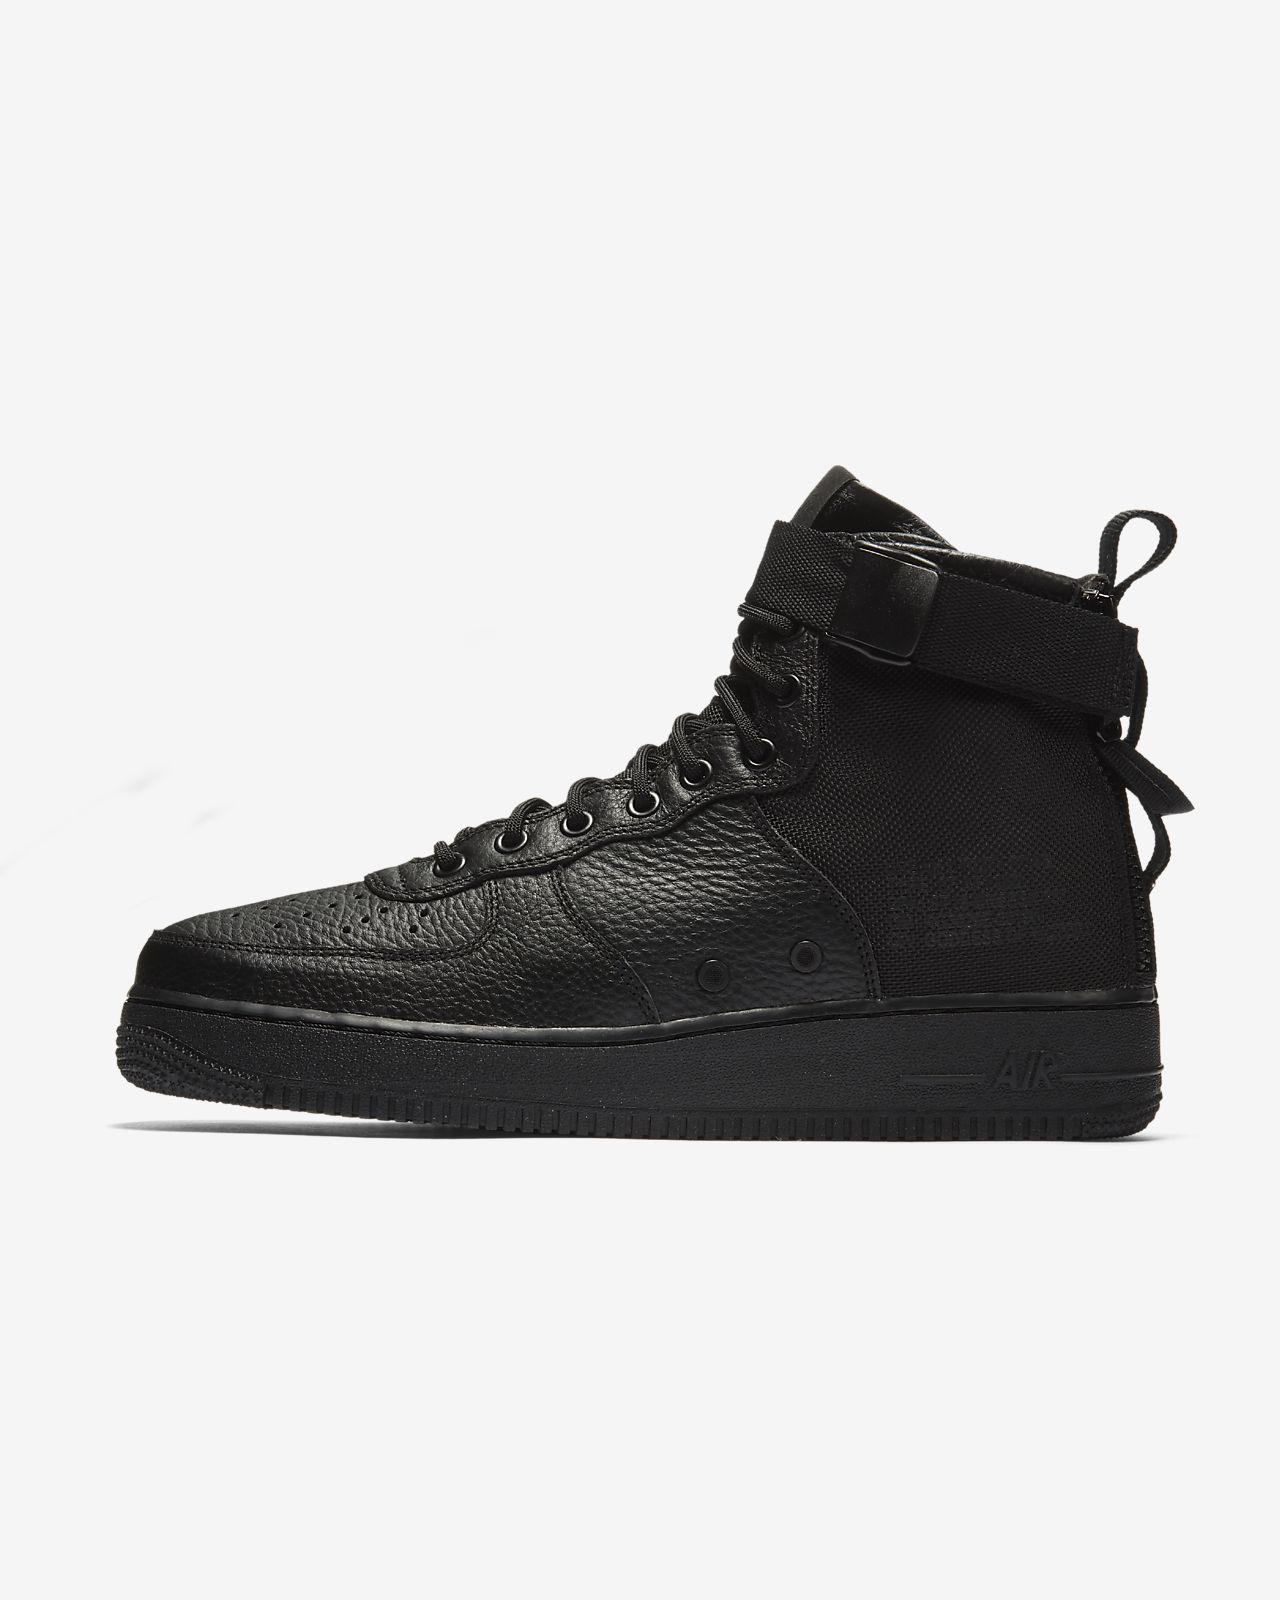 check out b27e5 719c6 Zapatillas Nike SF Air Force Zapatillas 1 Mid para 1 Force hombre. 44378cf  - ferrarif12price.online